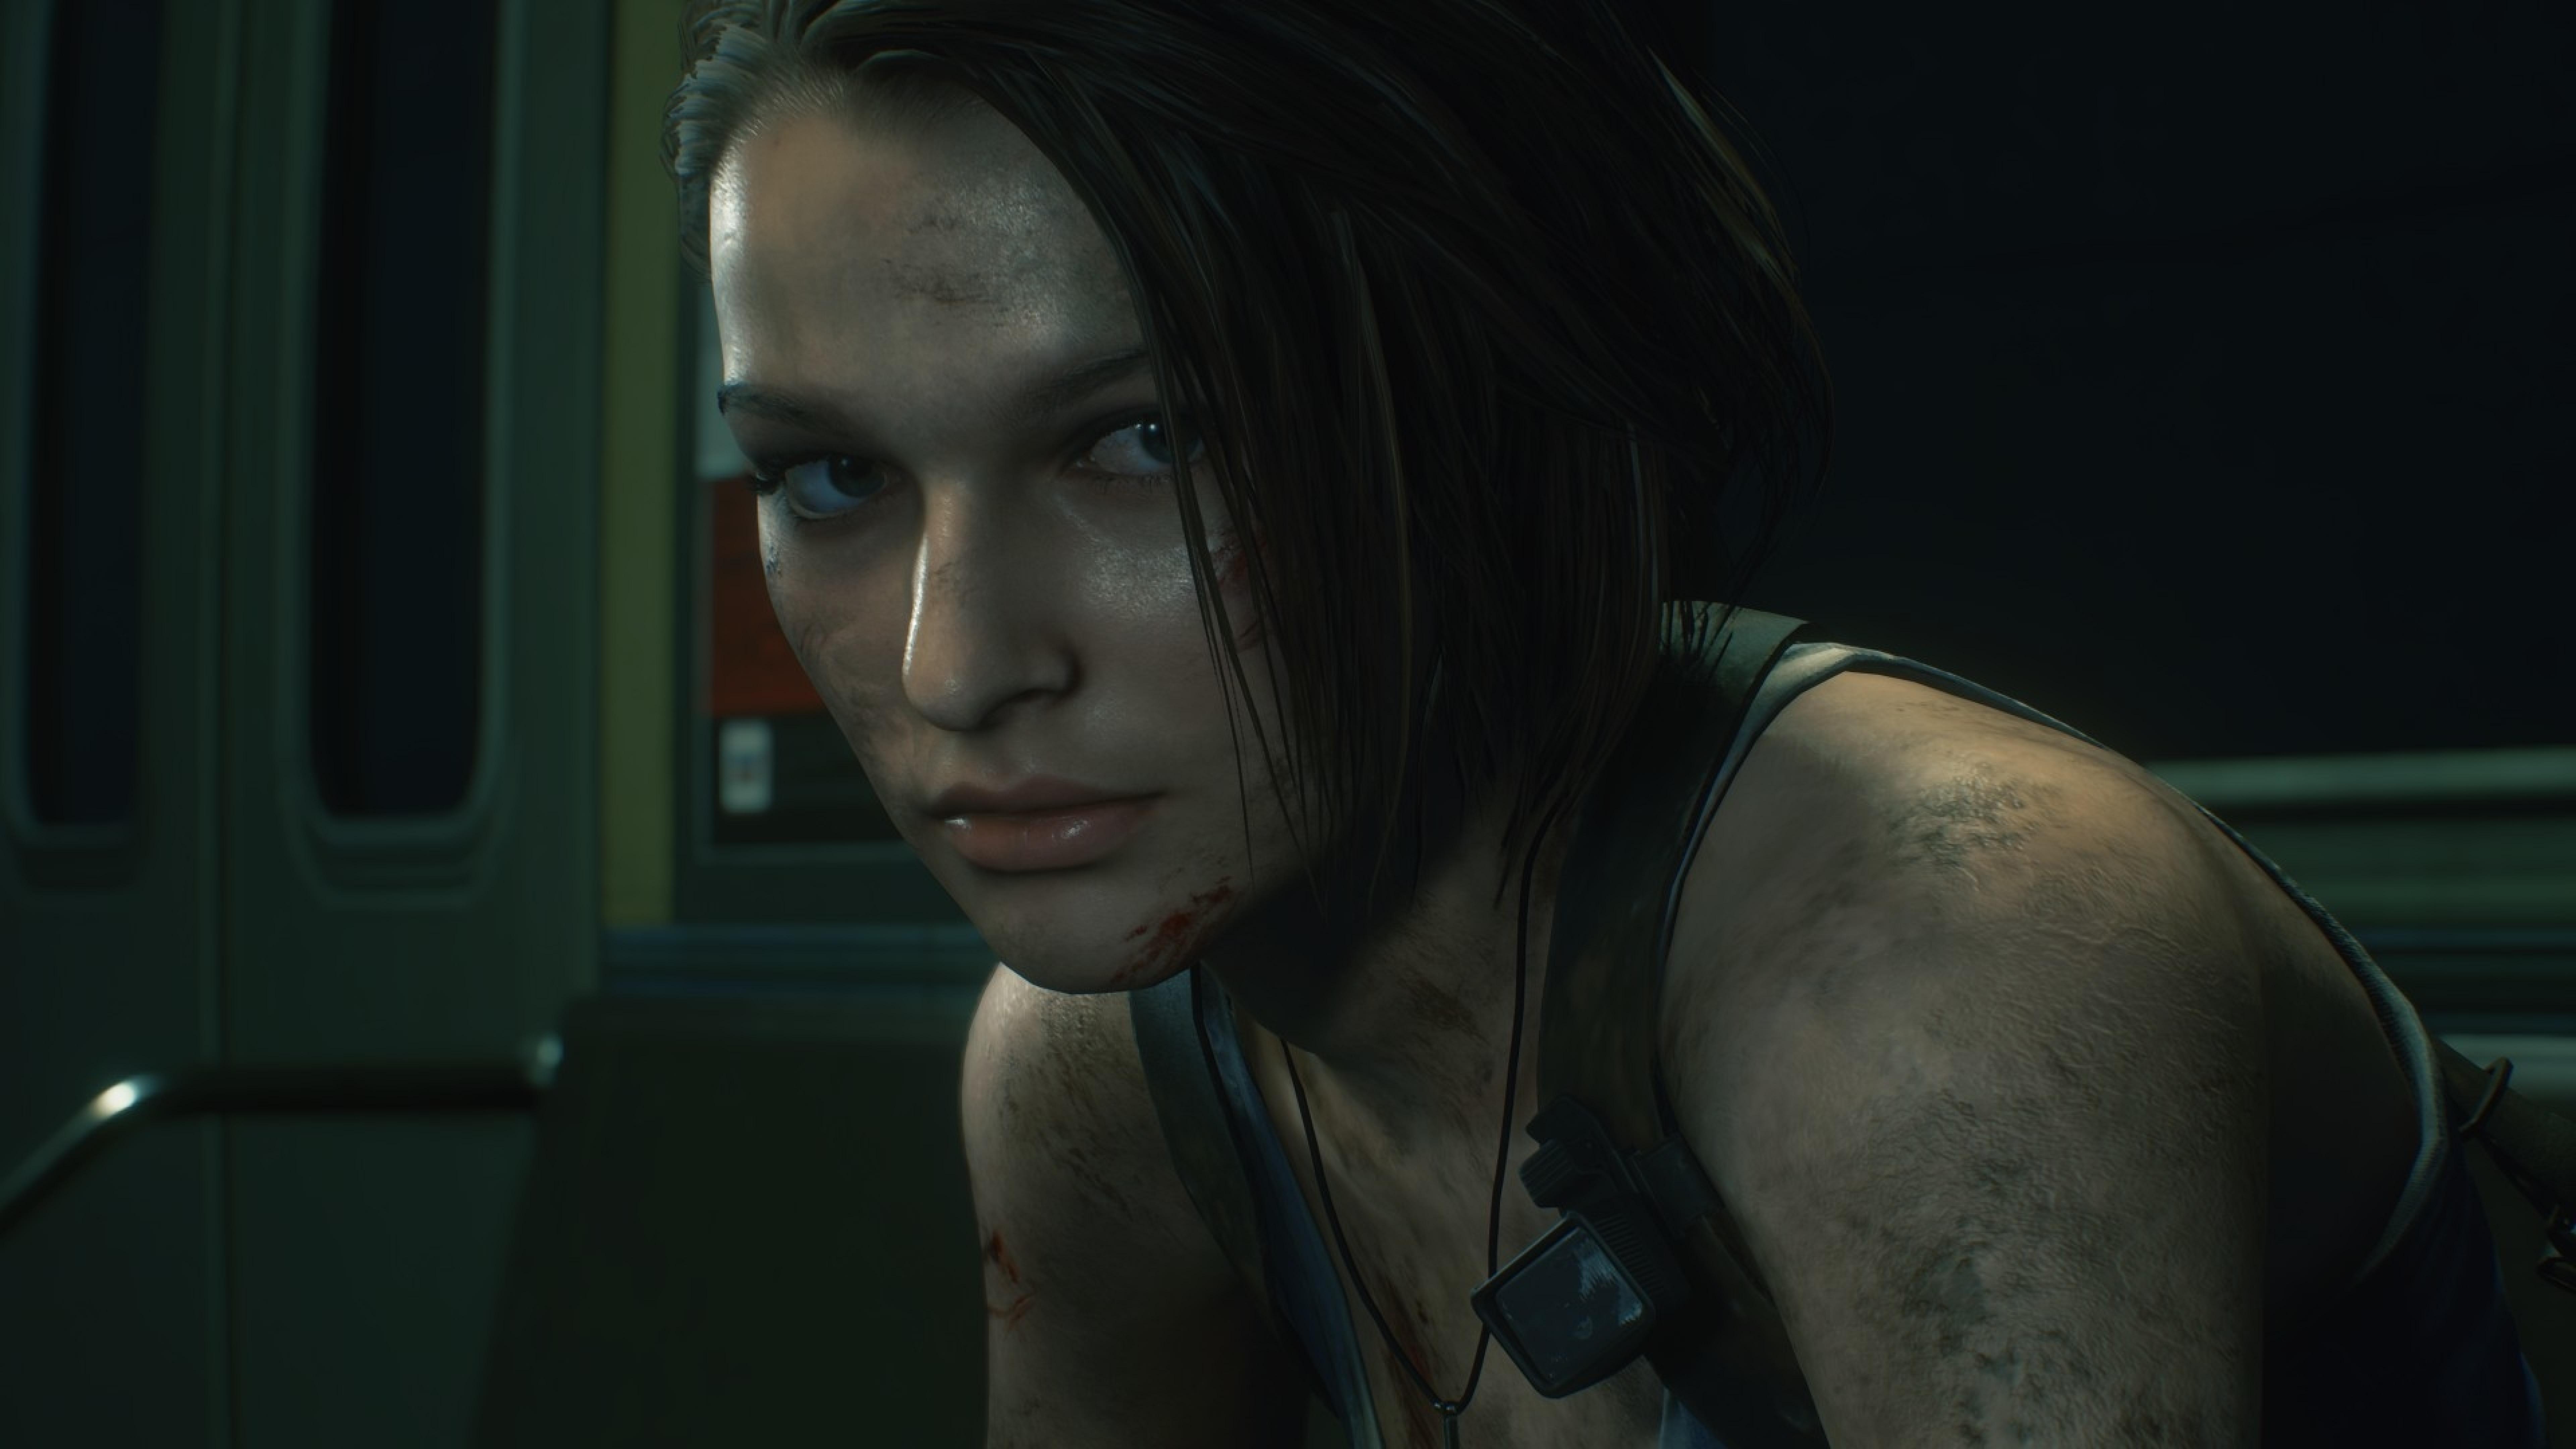 7680x4320 Jill Valentine Resident Evil 3 8k Wallpaper Hd Games 4k